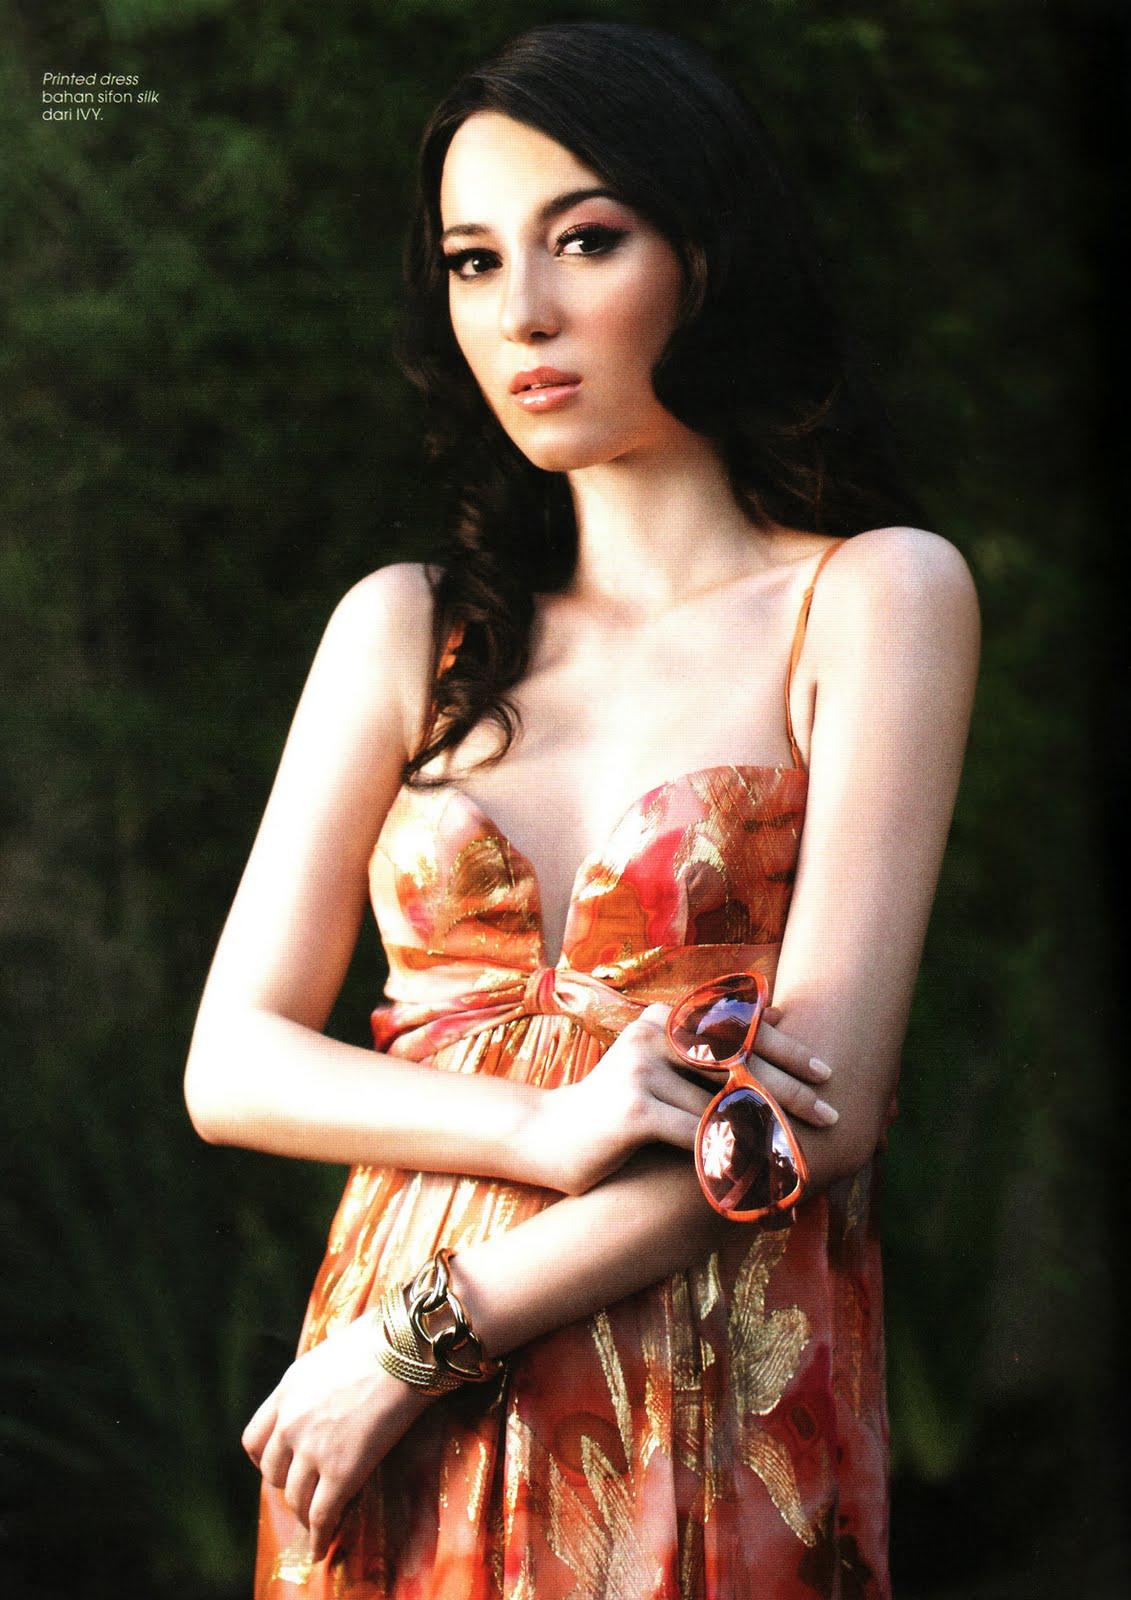 Julie Estellebugilciumanmesum Abg Cantik Artis Indonesia